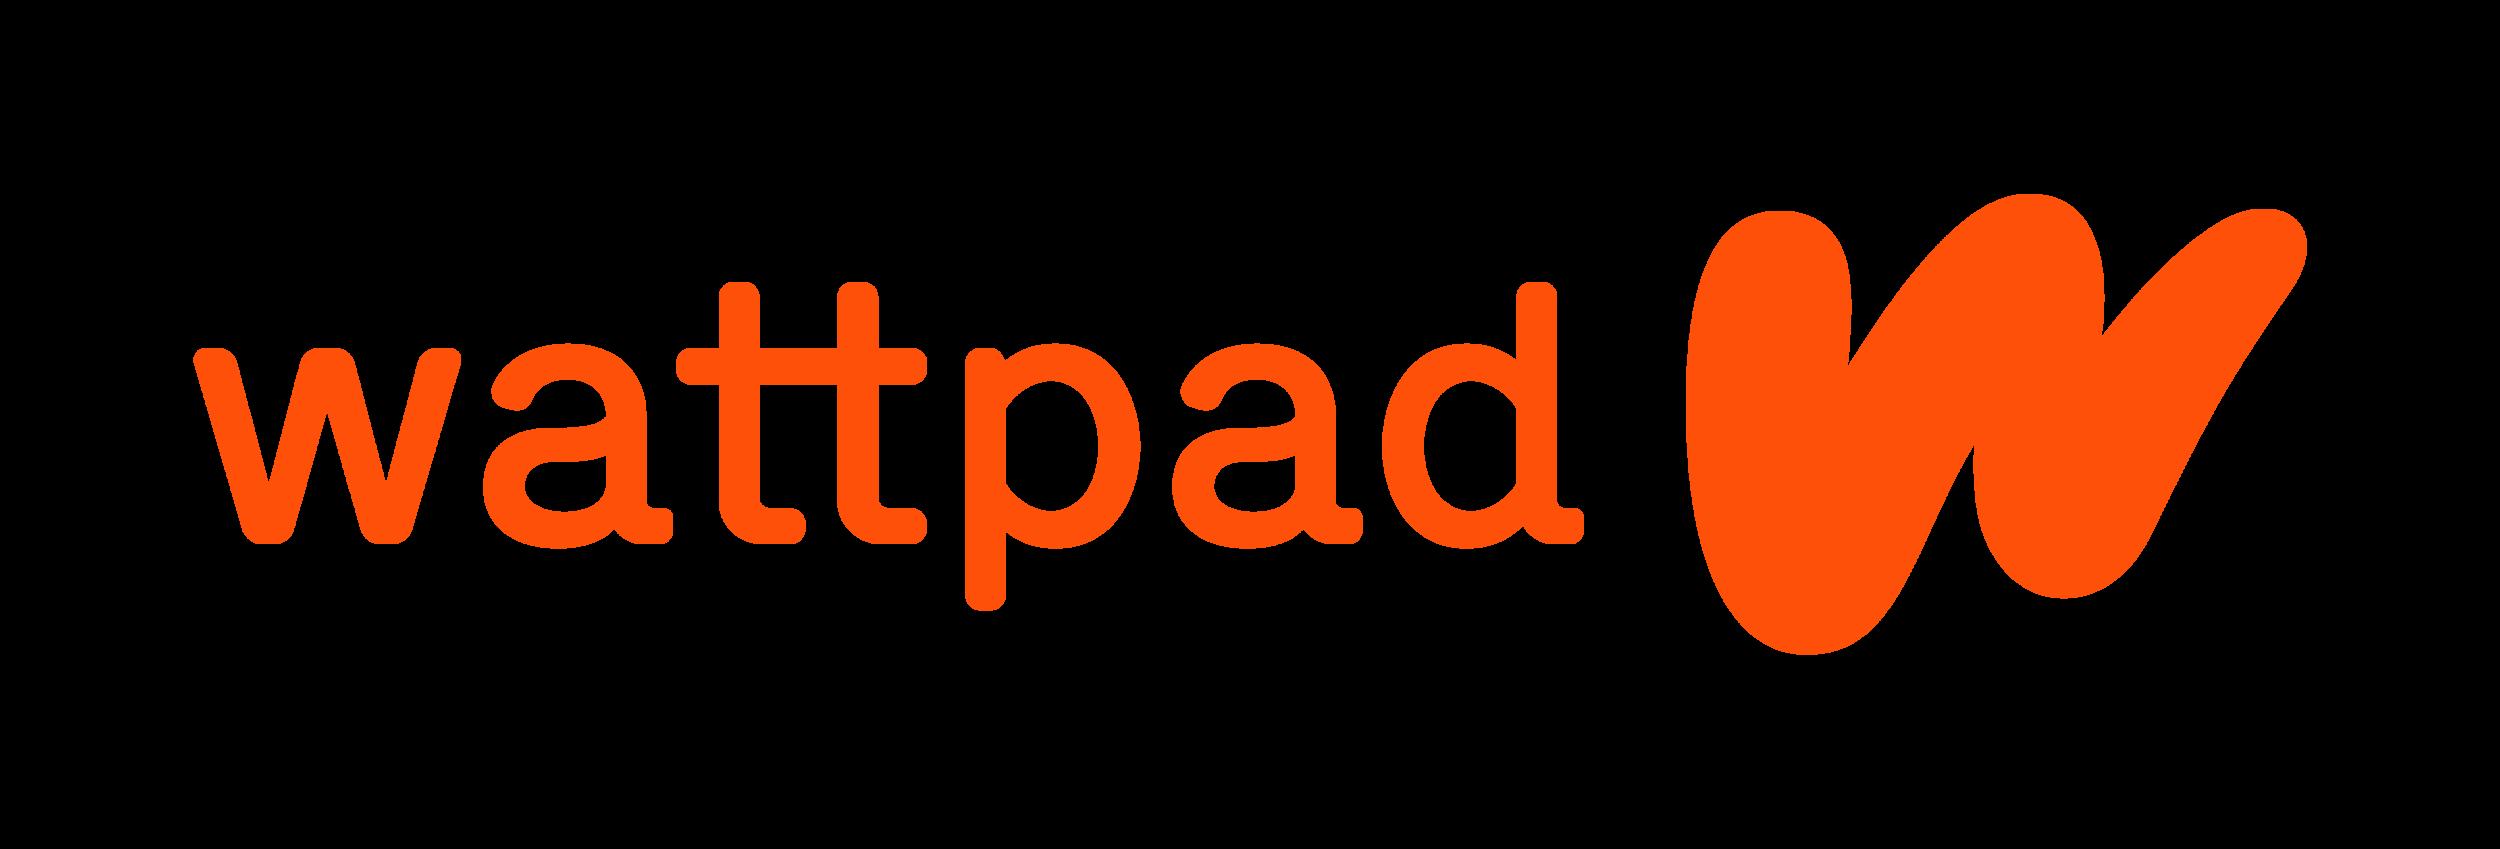 Wattpad_Horizontal_Logo_Orange_RGB_HR.png